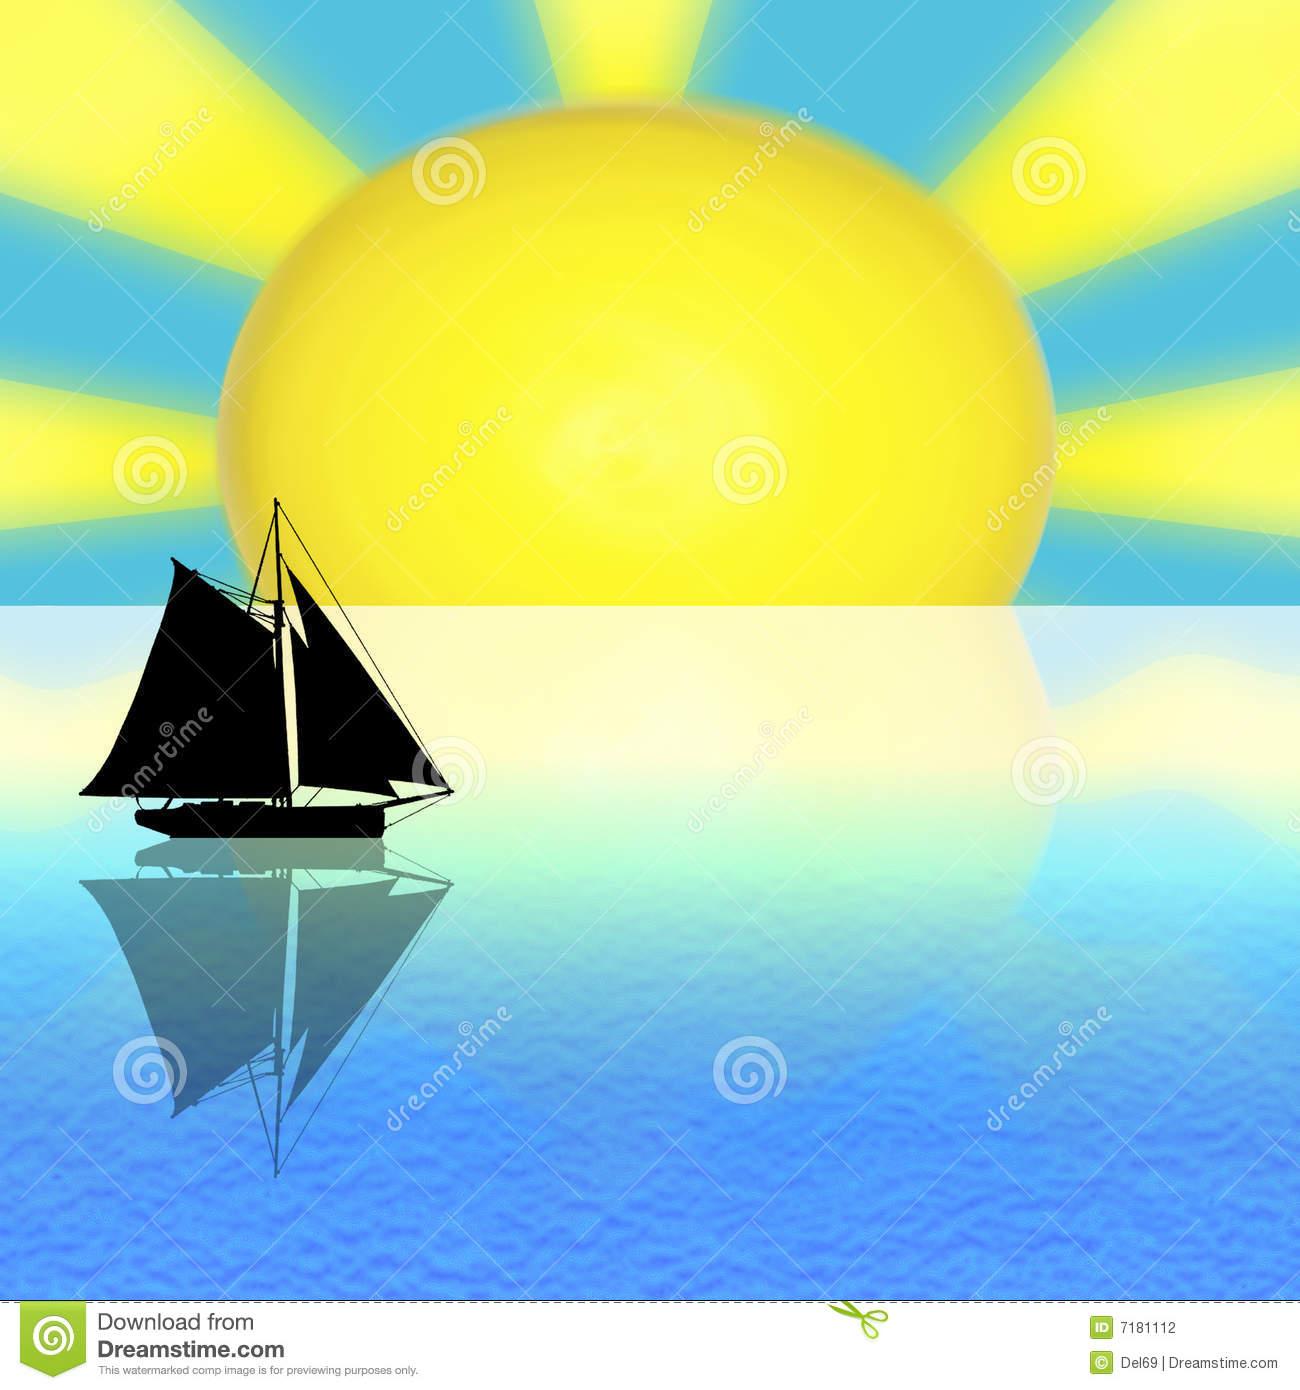 Sun and sea clipart.